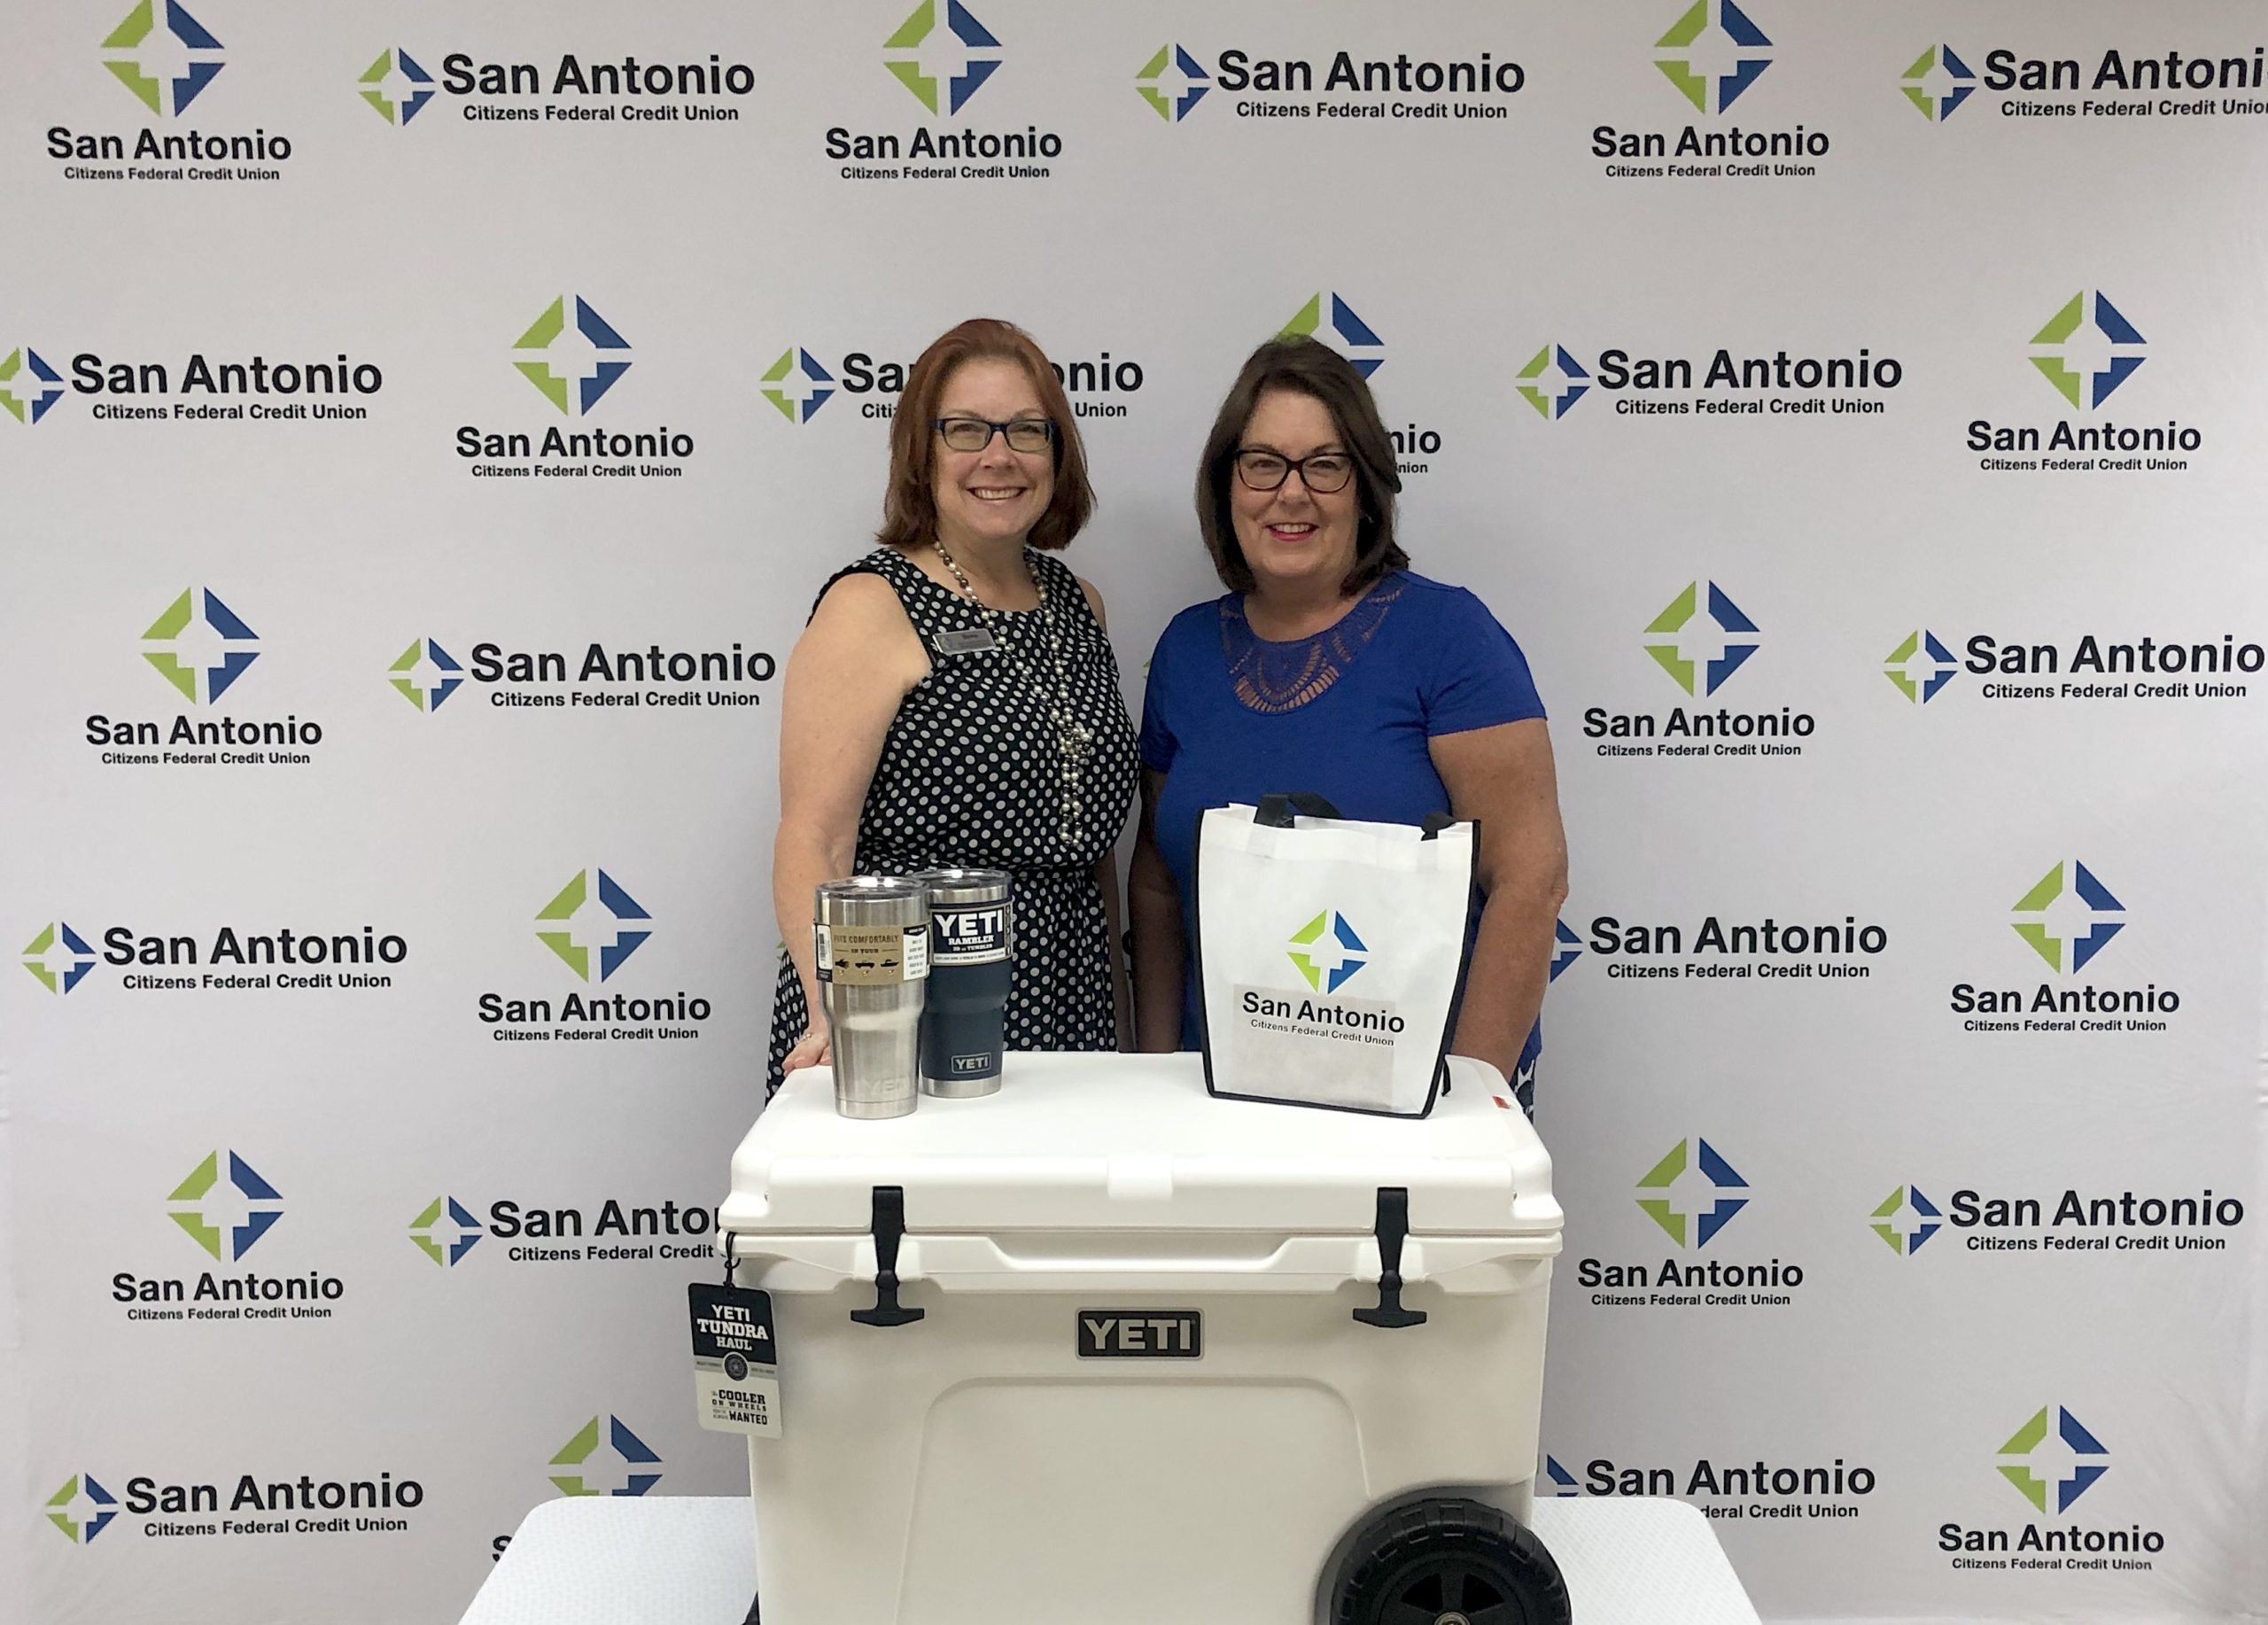 Winner of an SACFCU employee presenting a Yeti Cooler to the 2020 eStatement Contest winner.